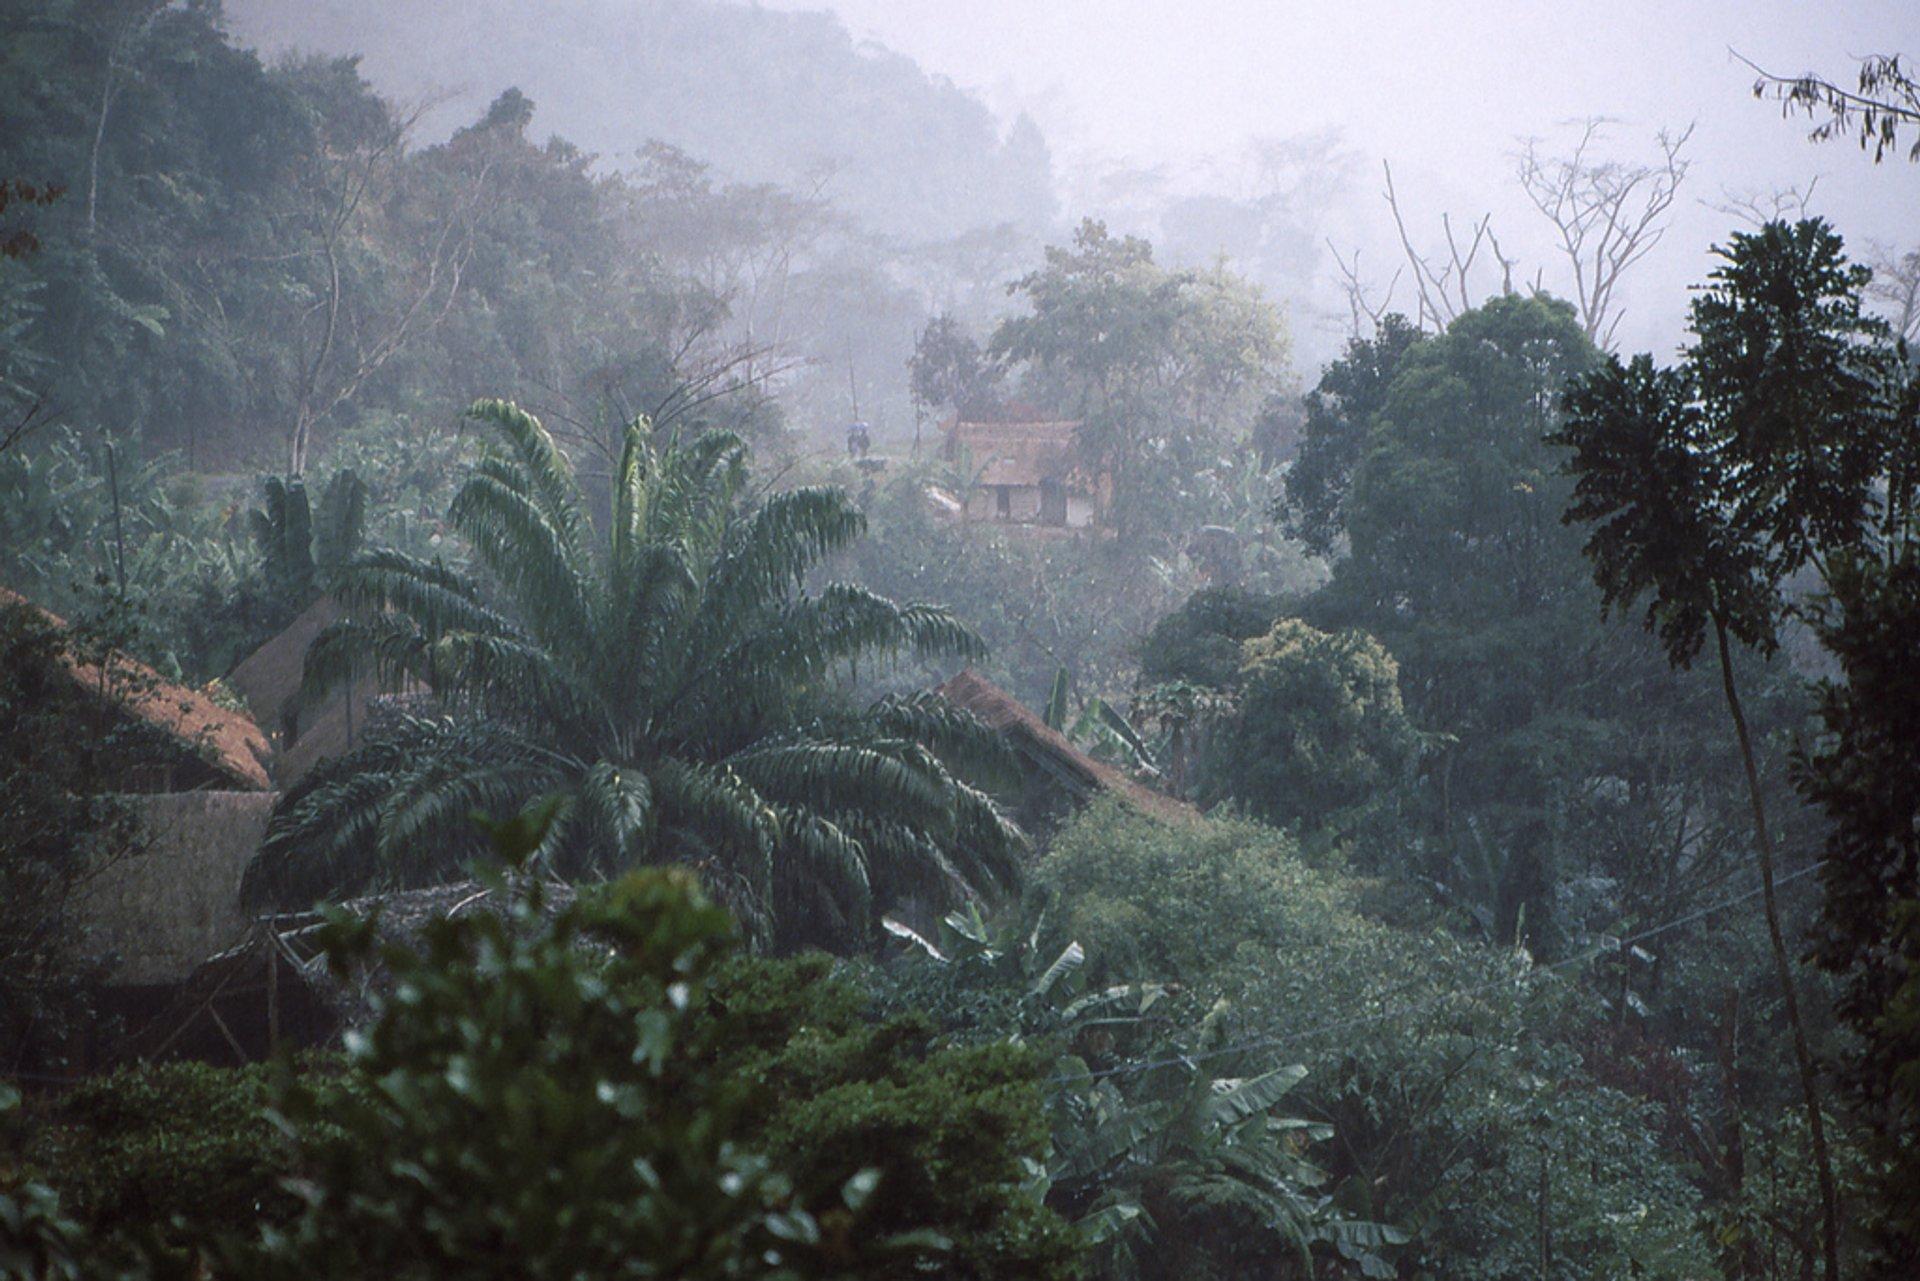 Rainy Season in Madagascar 2020 - Best Time